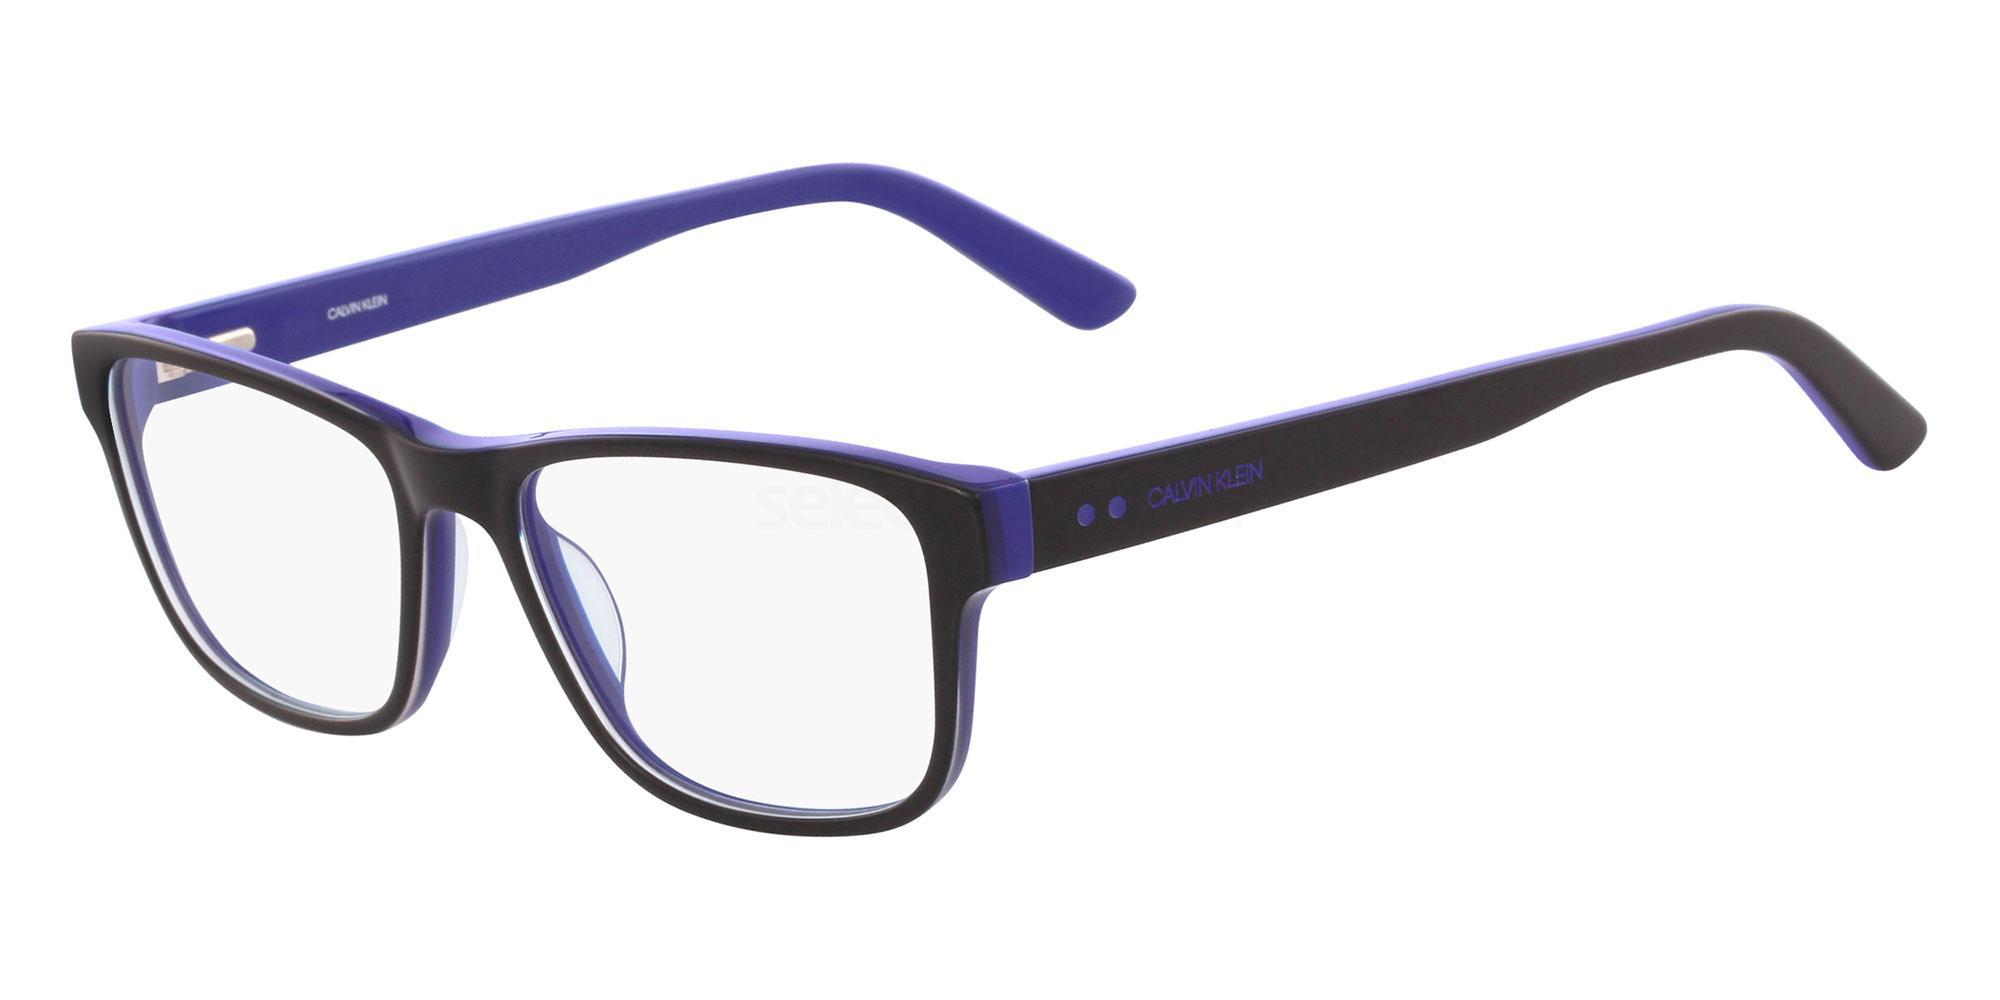 003 CK18540 Glasses, Calvin Klein